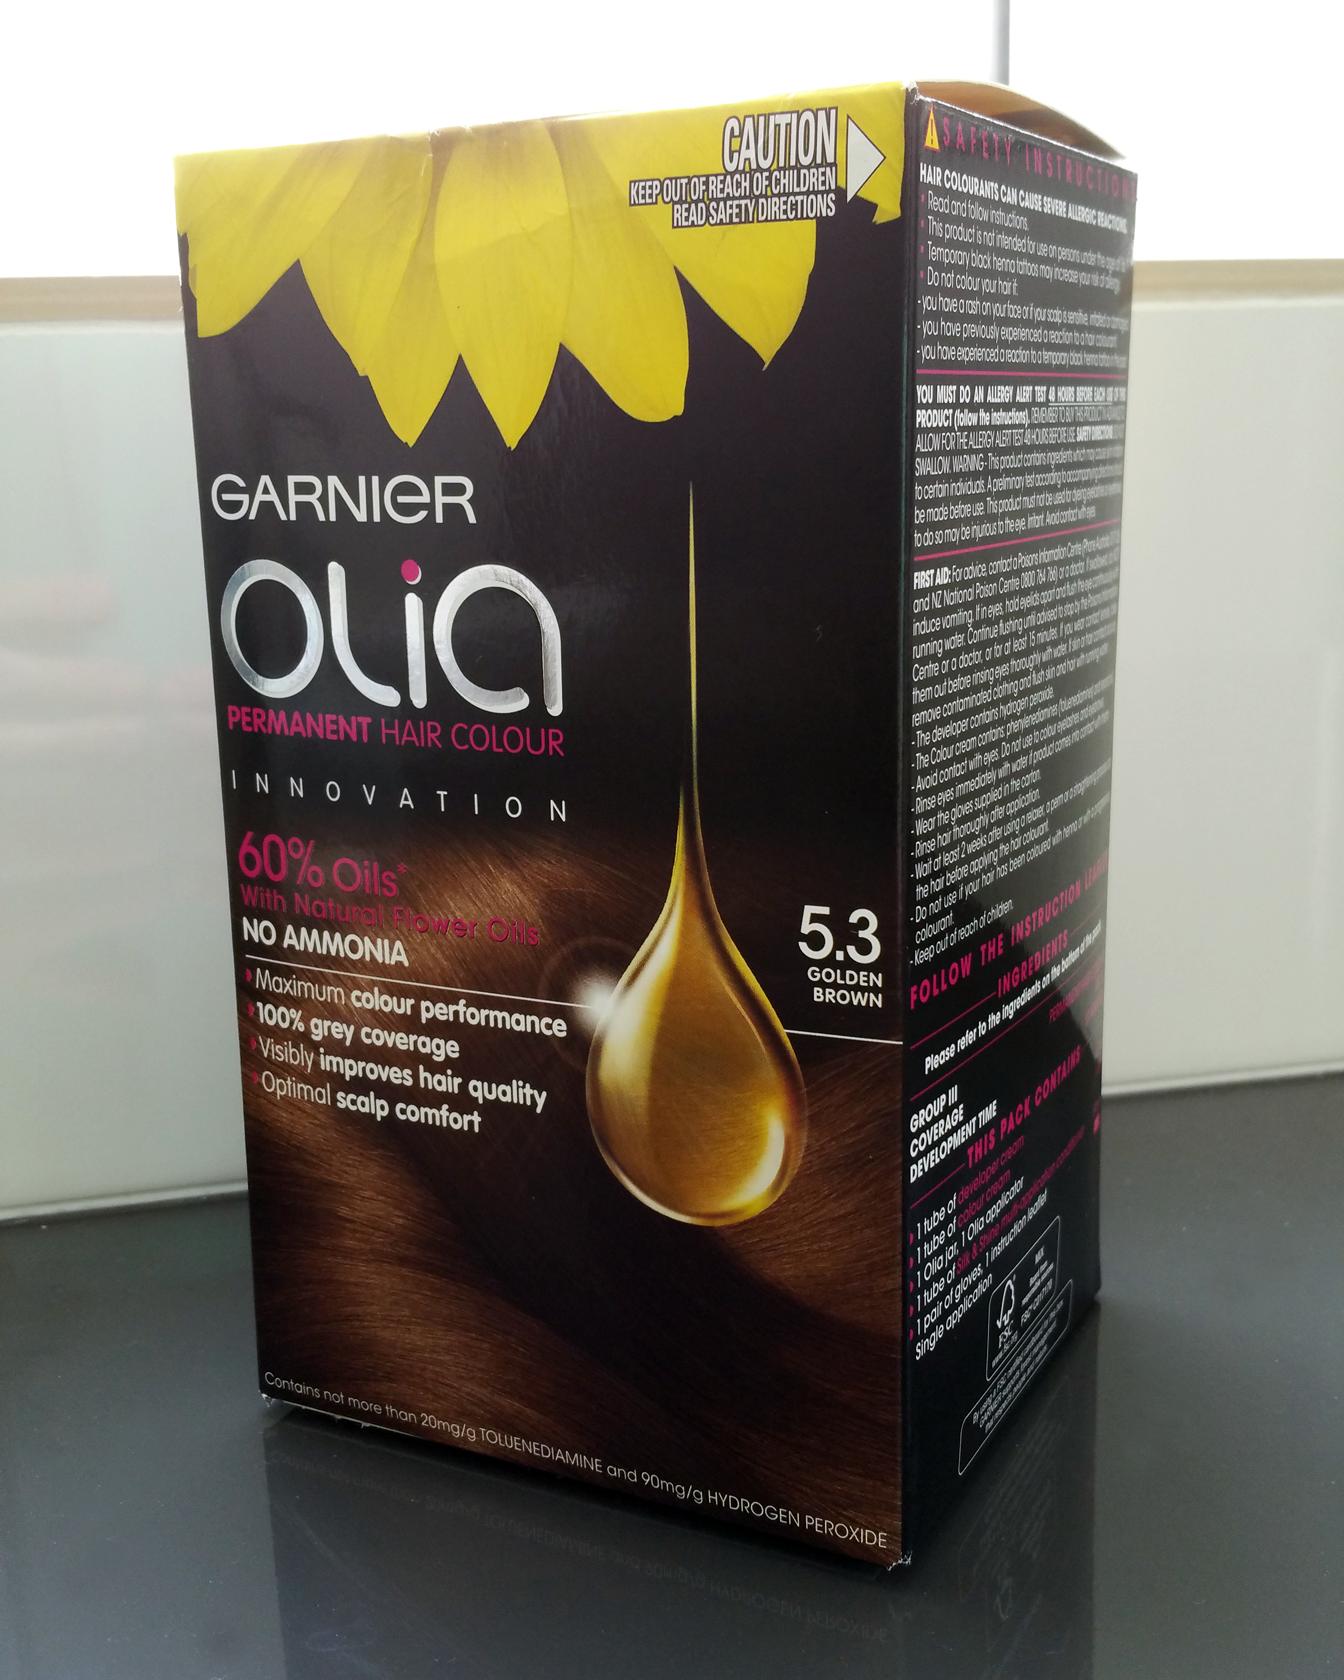 Garnier olia permanent hair colour golden brown 5 3 - Garnier Olia Permanent Hair Colour